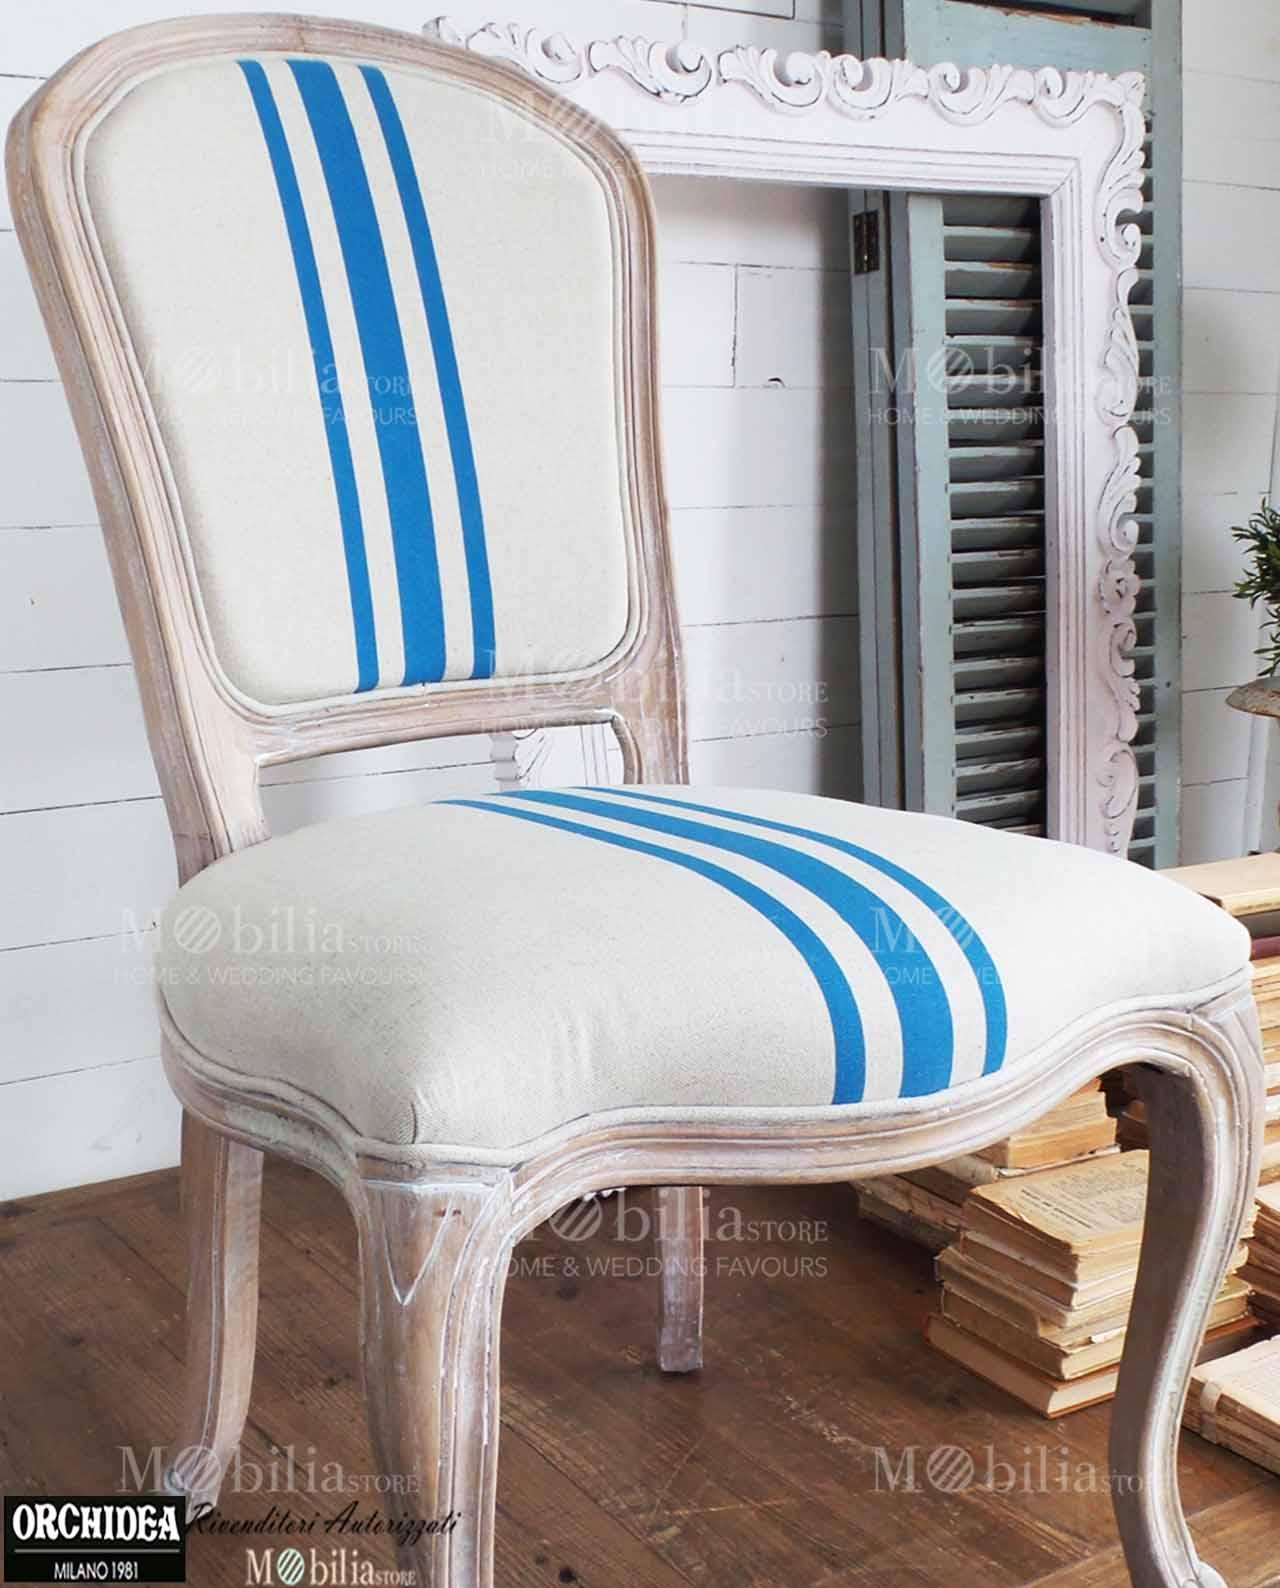 Sedie imbottite legno naturale stile marinaro beige e turchese for Sedie turchesi